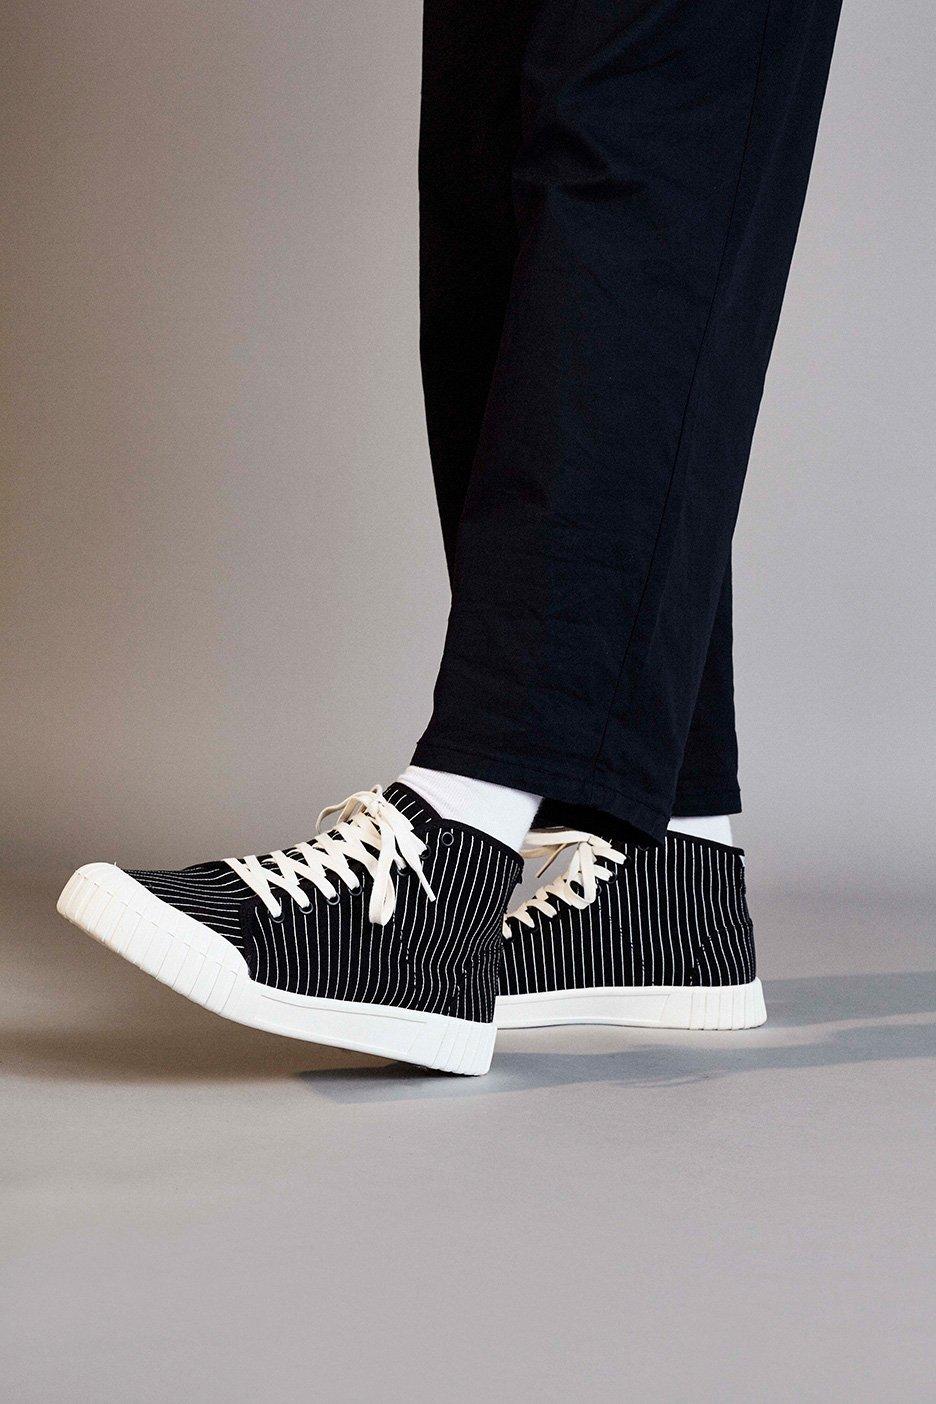 good-news-sneakers-aw17-image-24.jpg